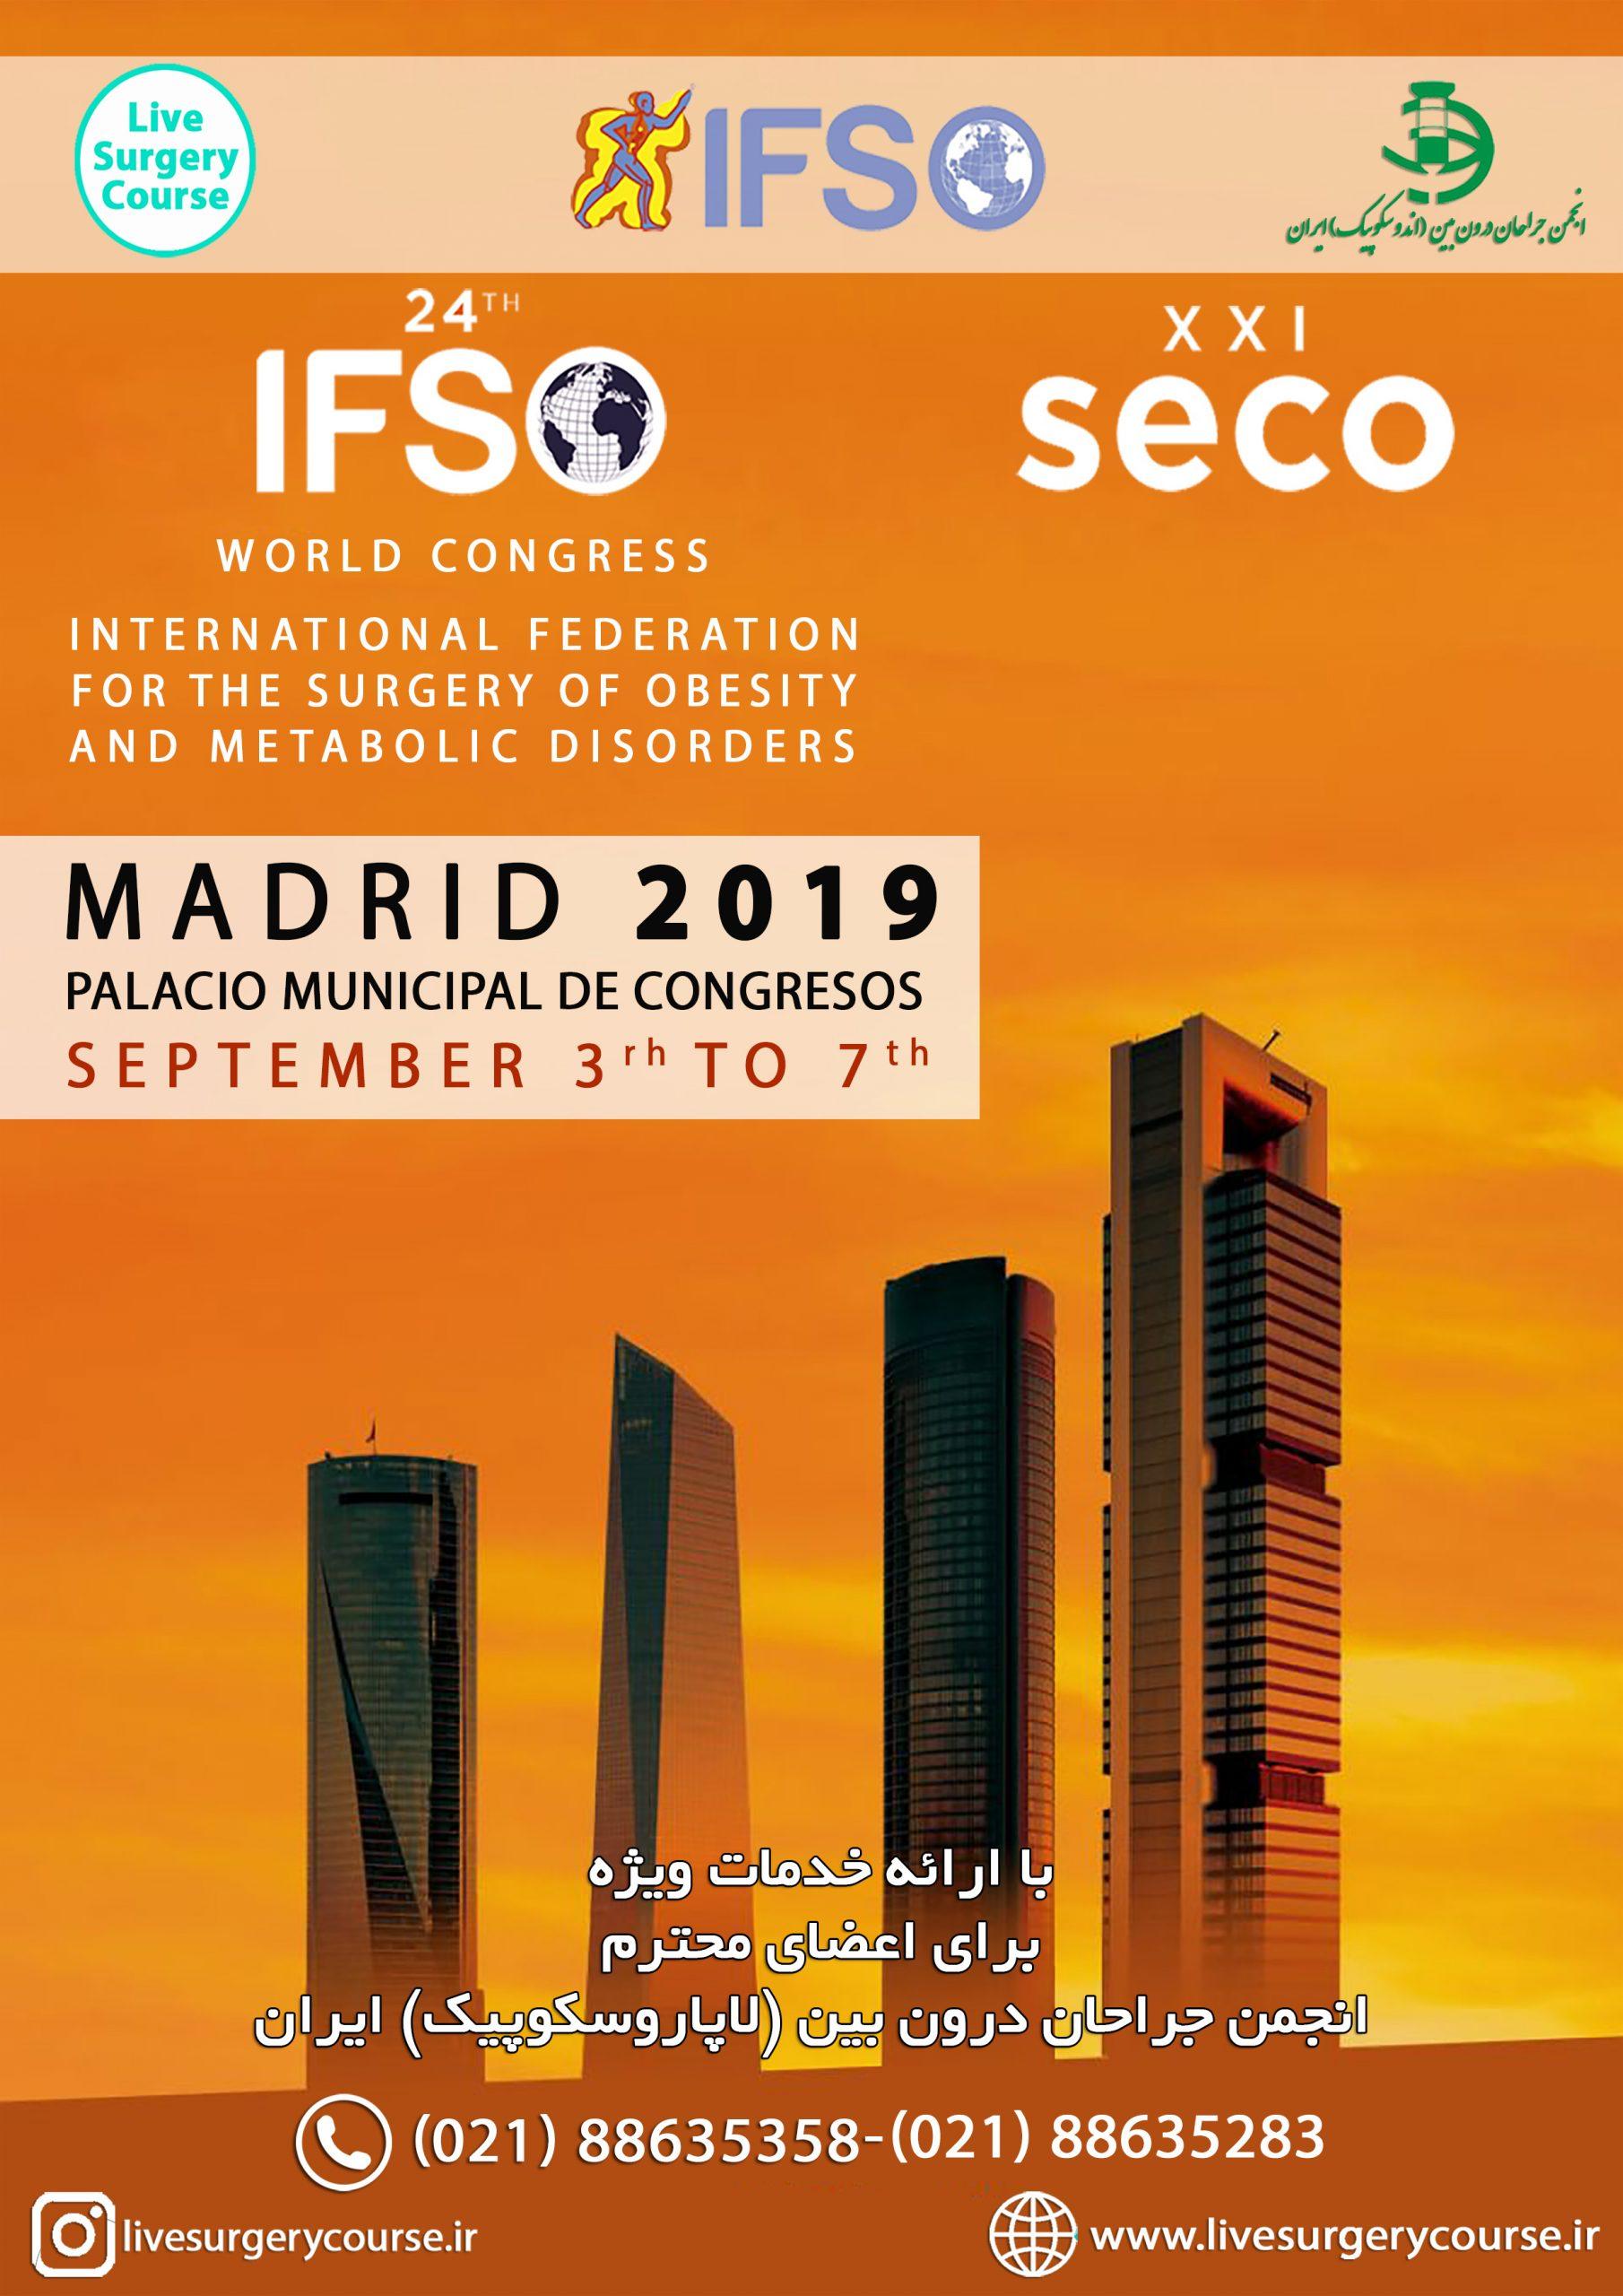 IFSO-MADRID980319